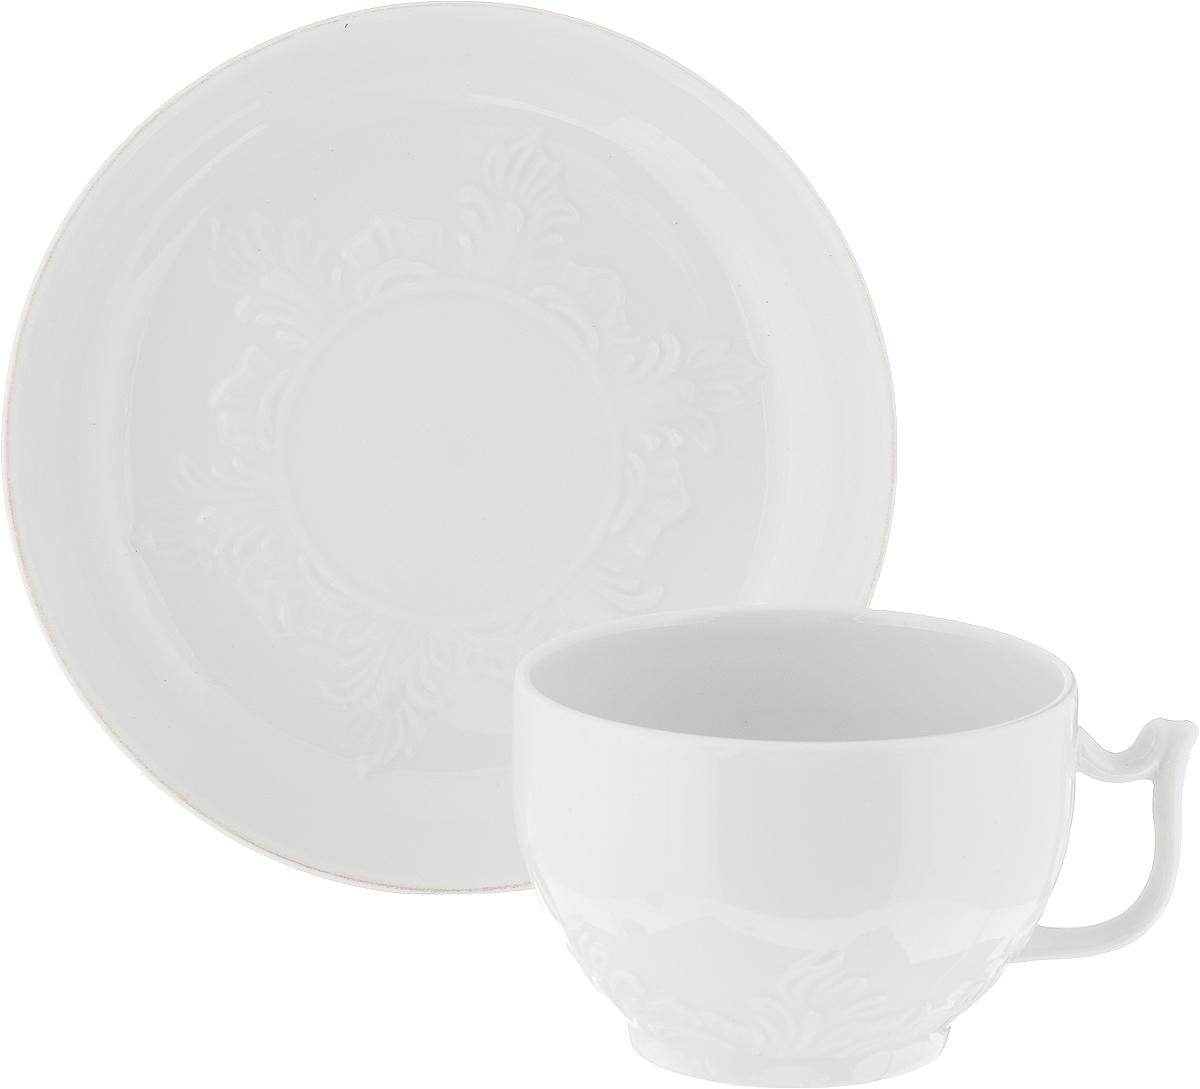 Чайная пара Фарфор Вербилок. 55000Б чайная пара фарфор вербилок маки 2 предмета 29951530